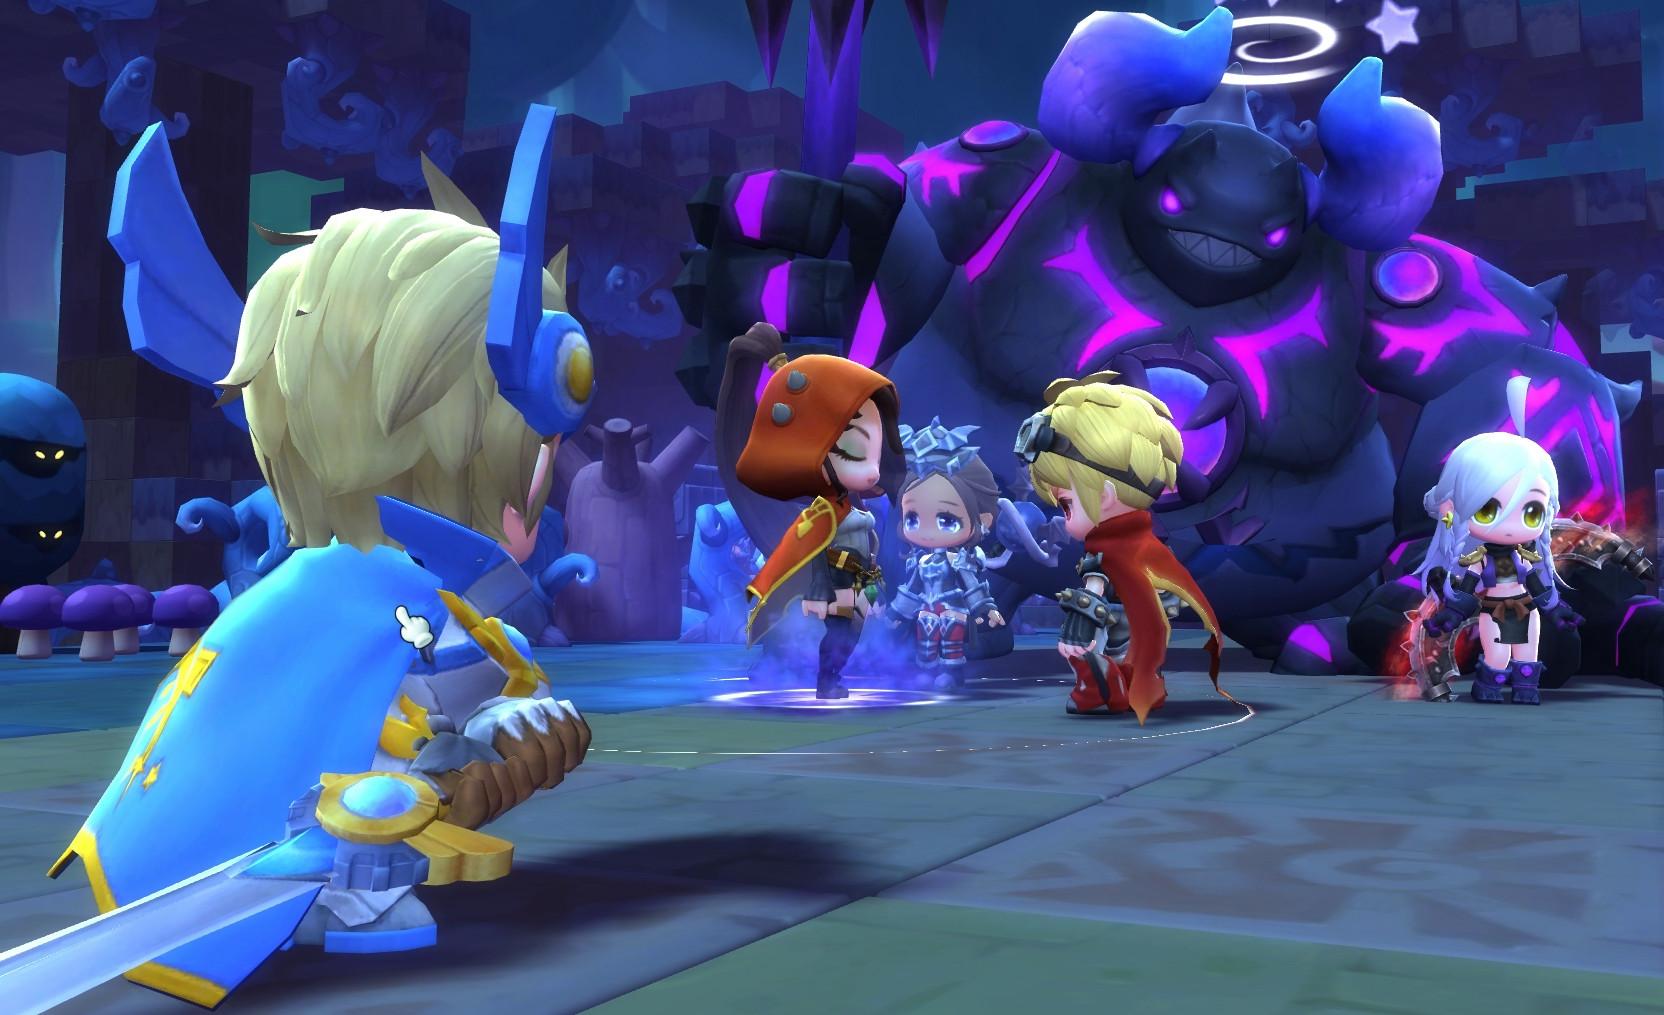 Tựa game online 'MapleStory 2' sắp ra mắt cộng đồng game thủ